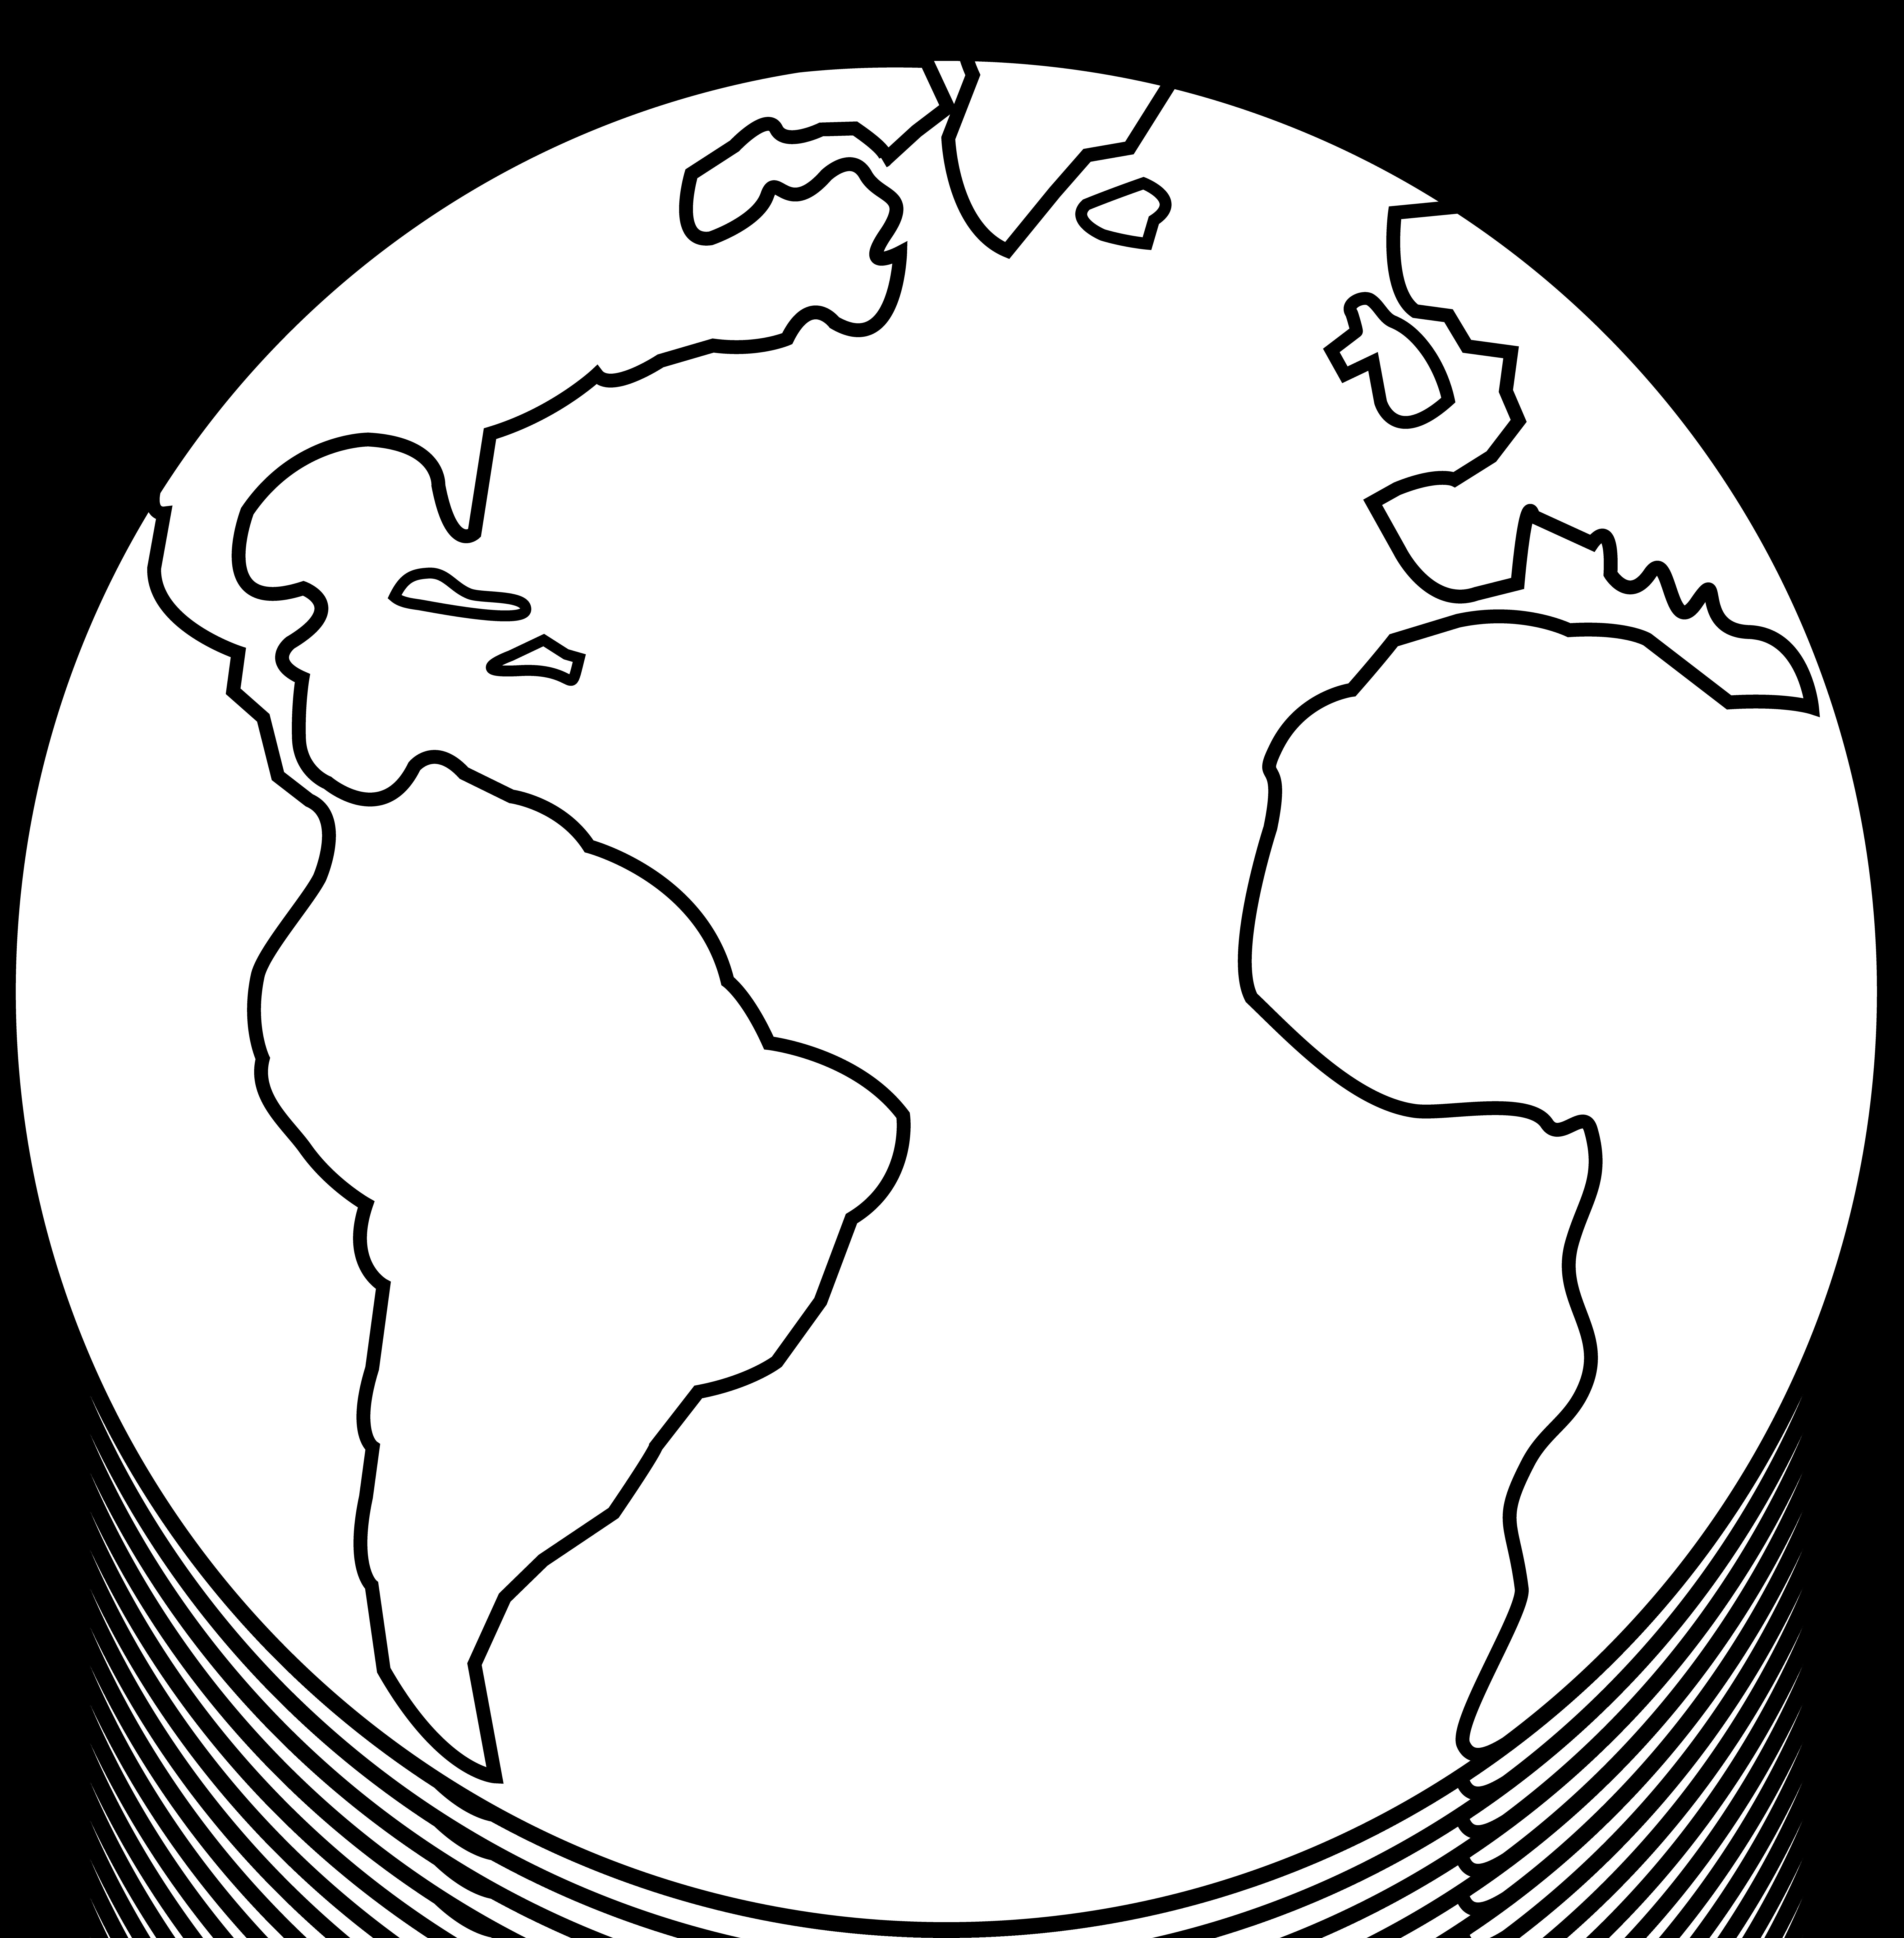 Colorable Earth Line Art Free Clip Art Earth Coloring Pages Earth Day Coloring Pages Earth Day Drawing